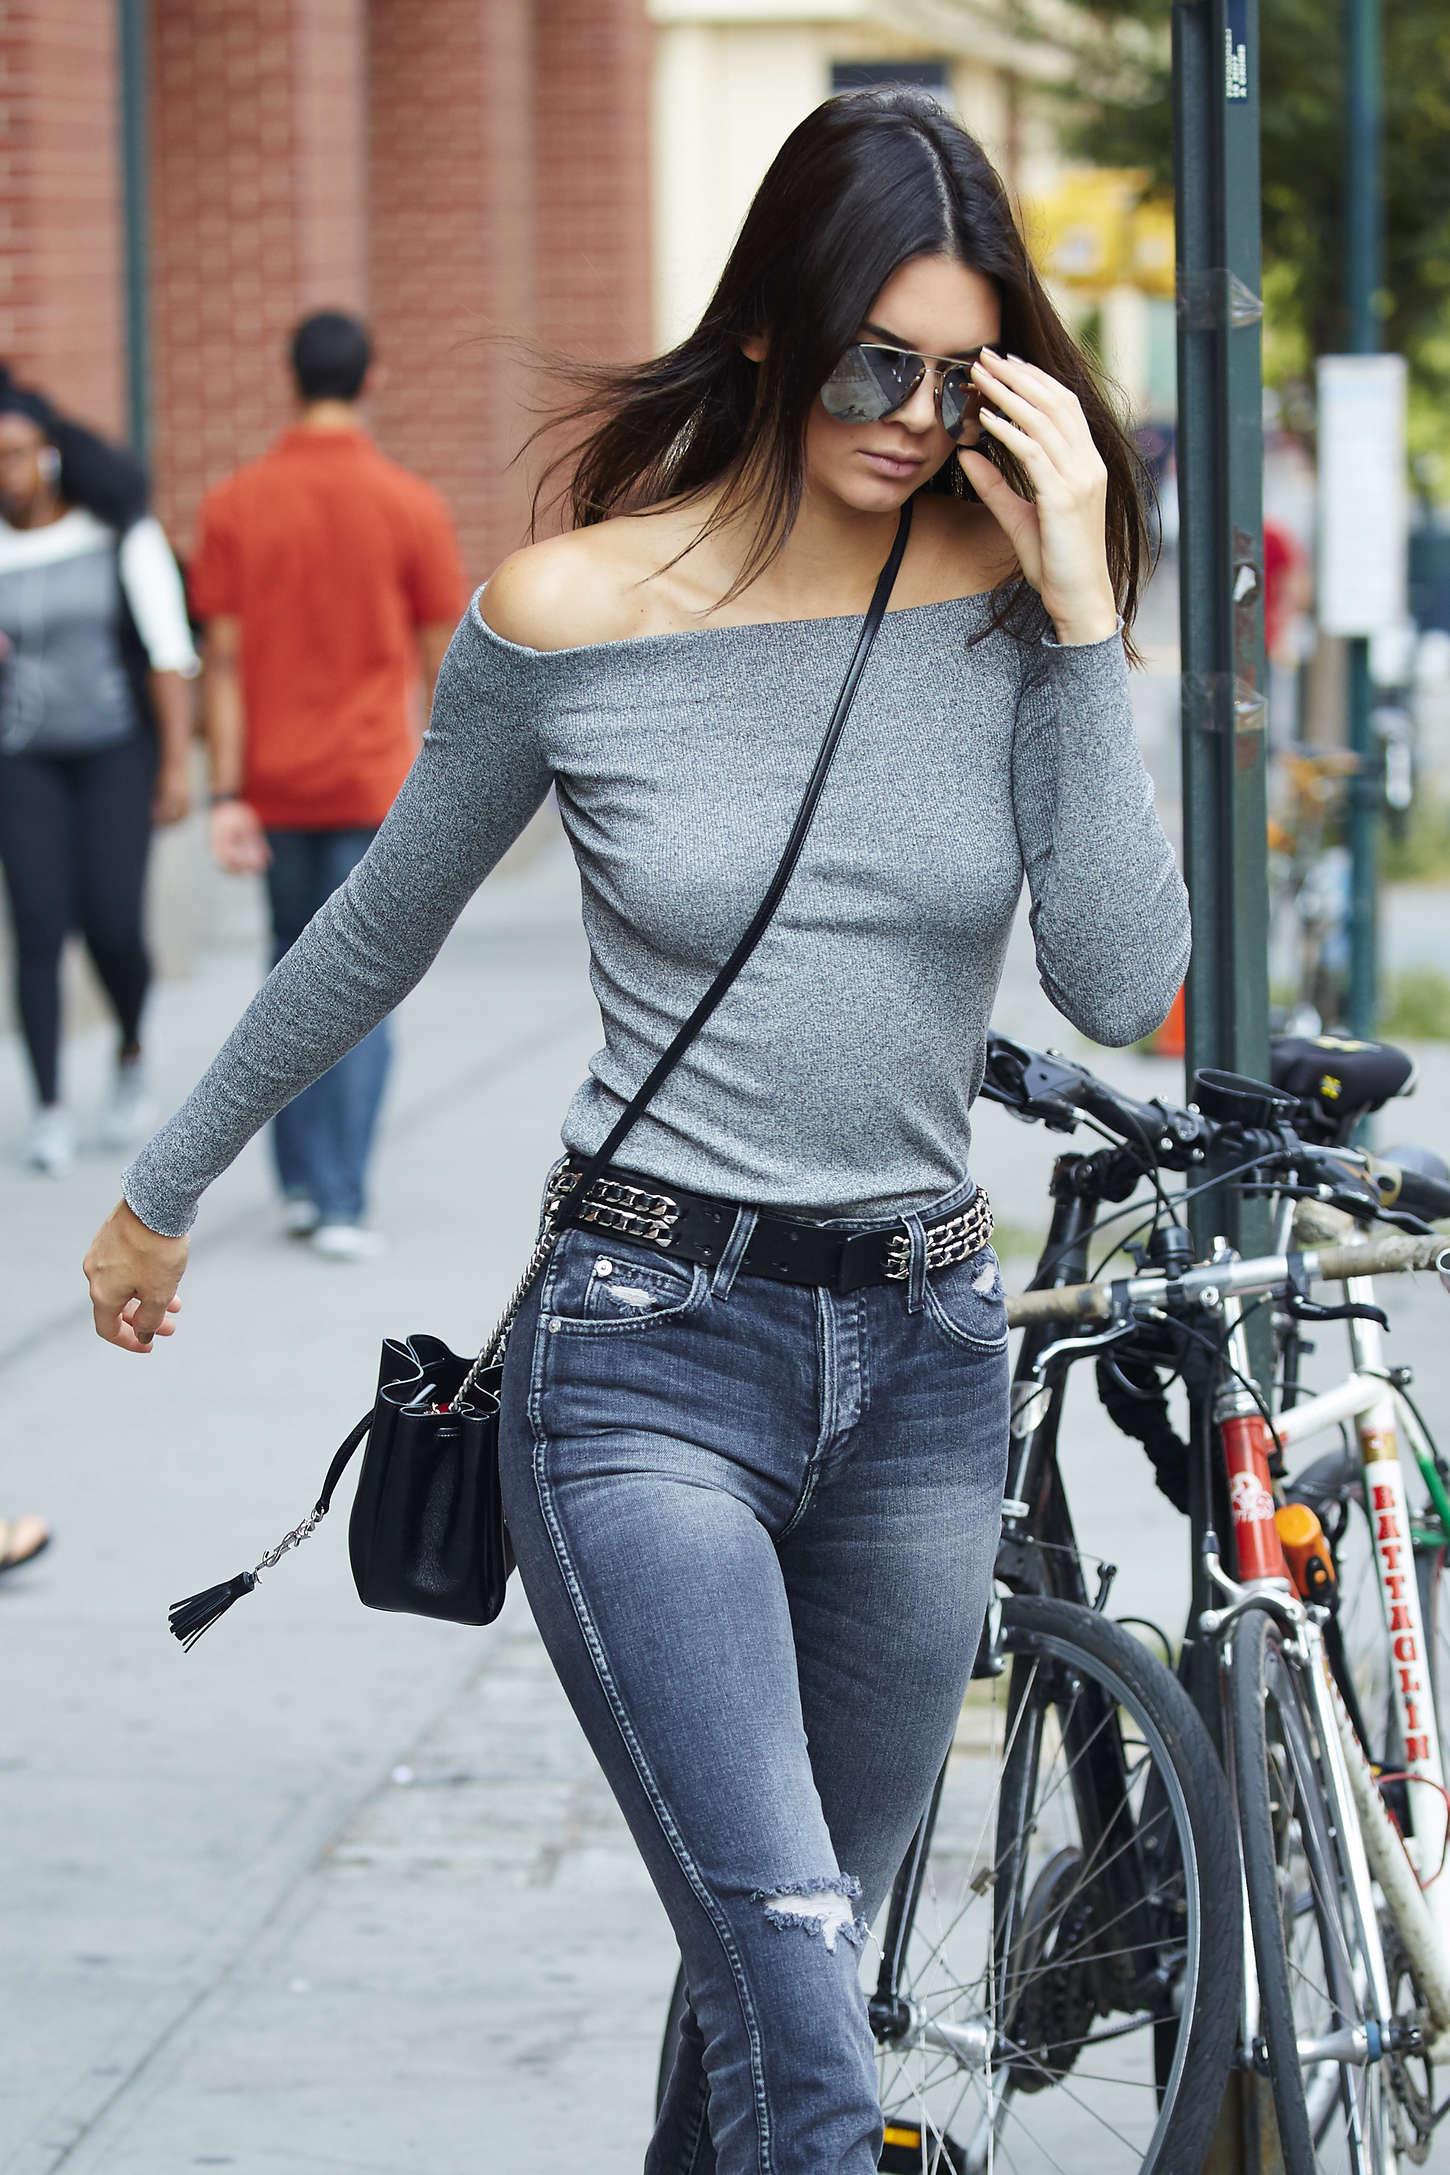 Kendall Jenner In Skinny Jeans 05 Gotceleb